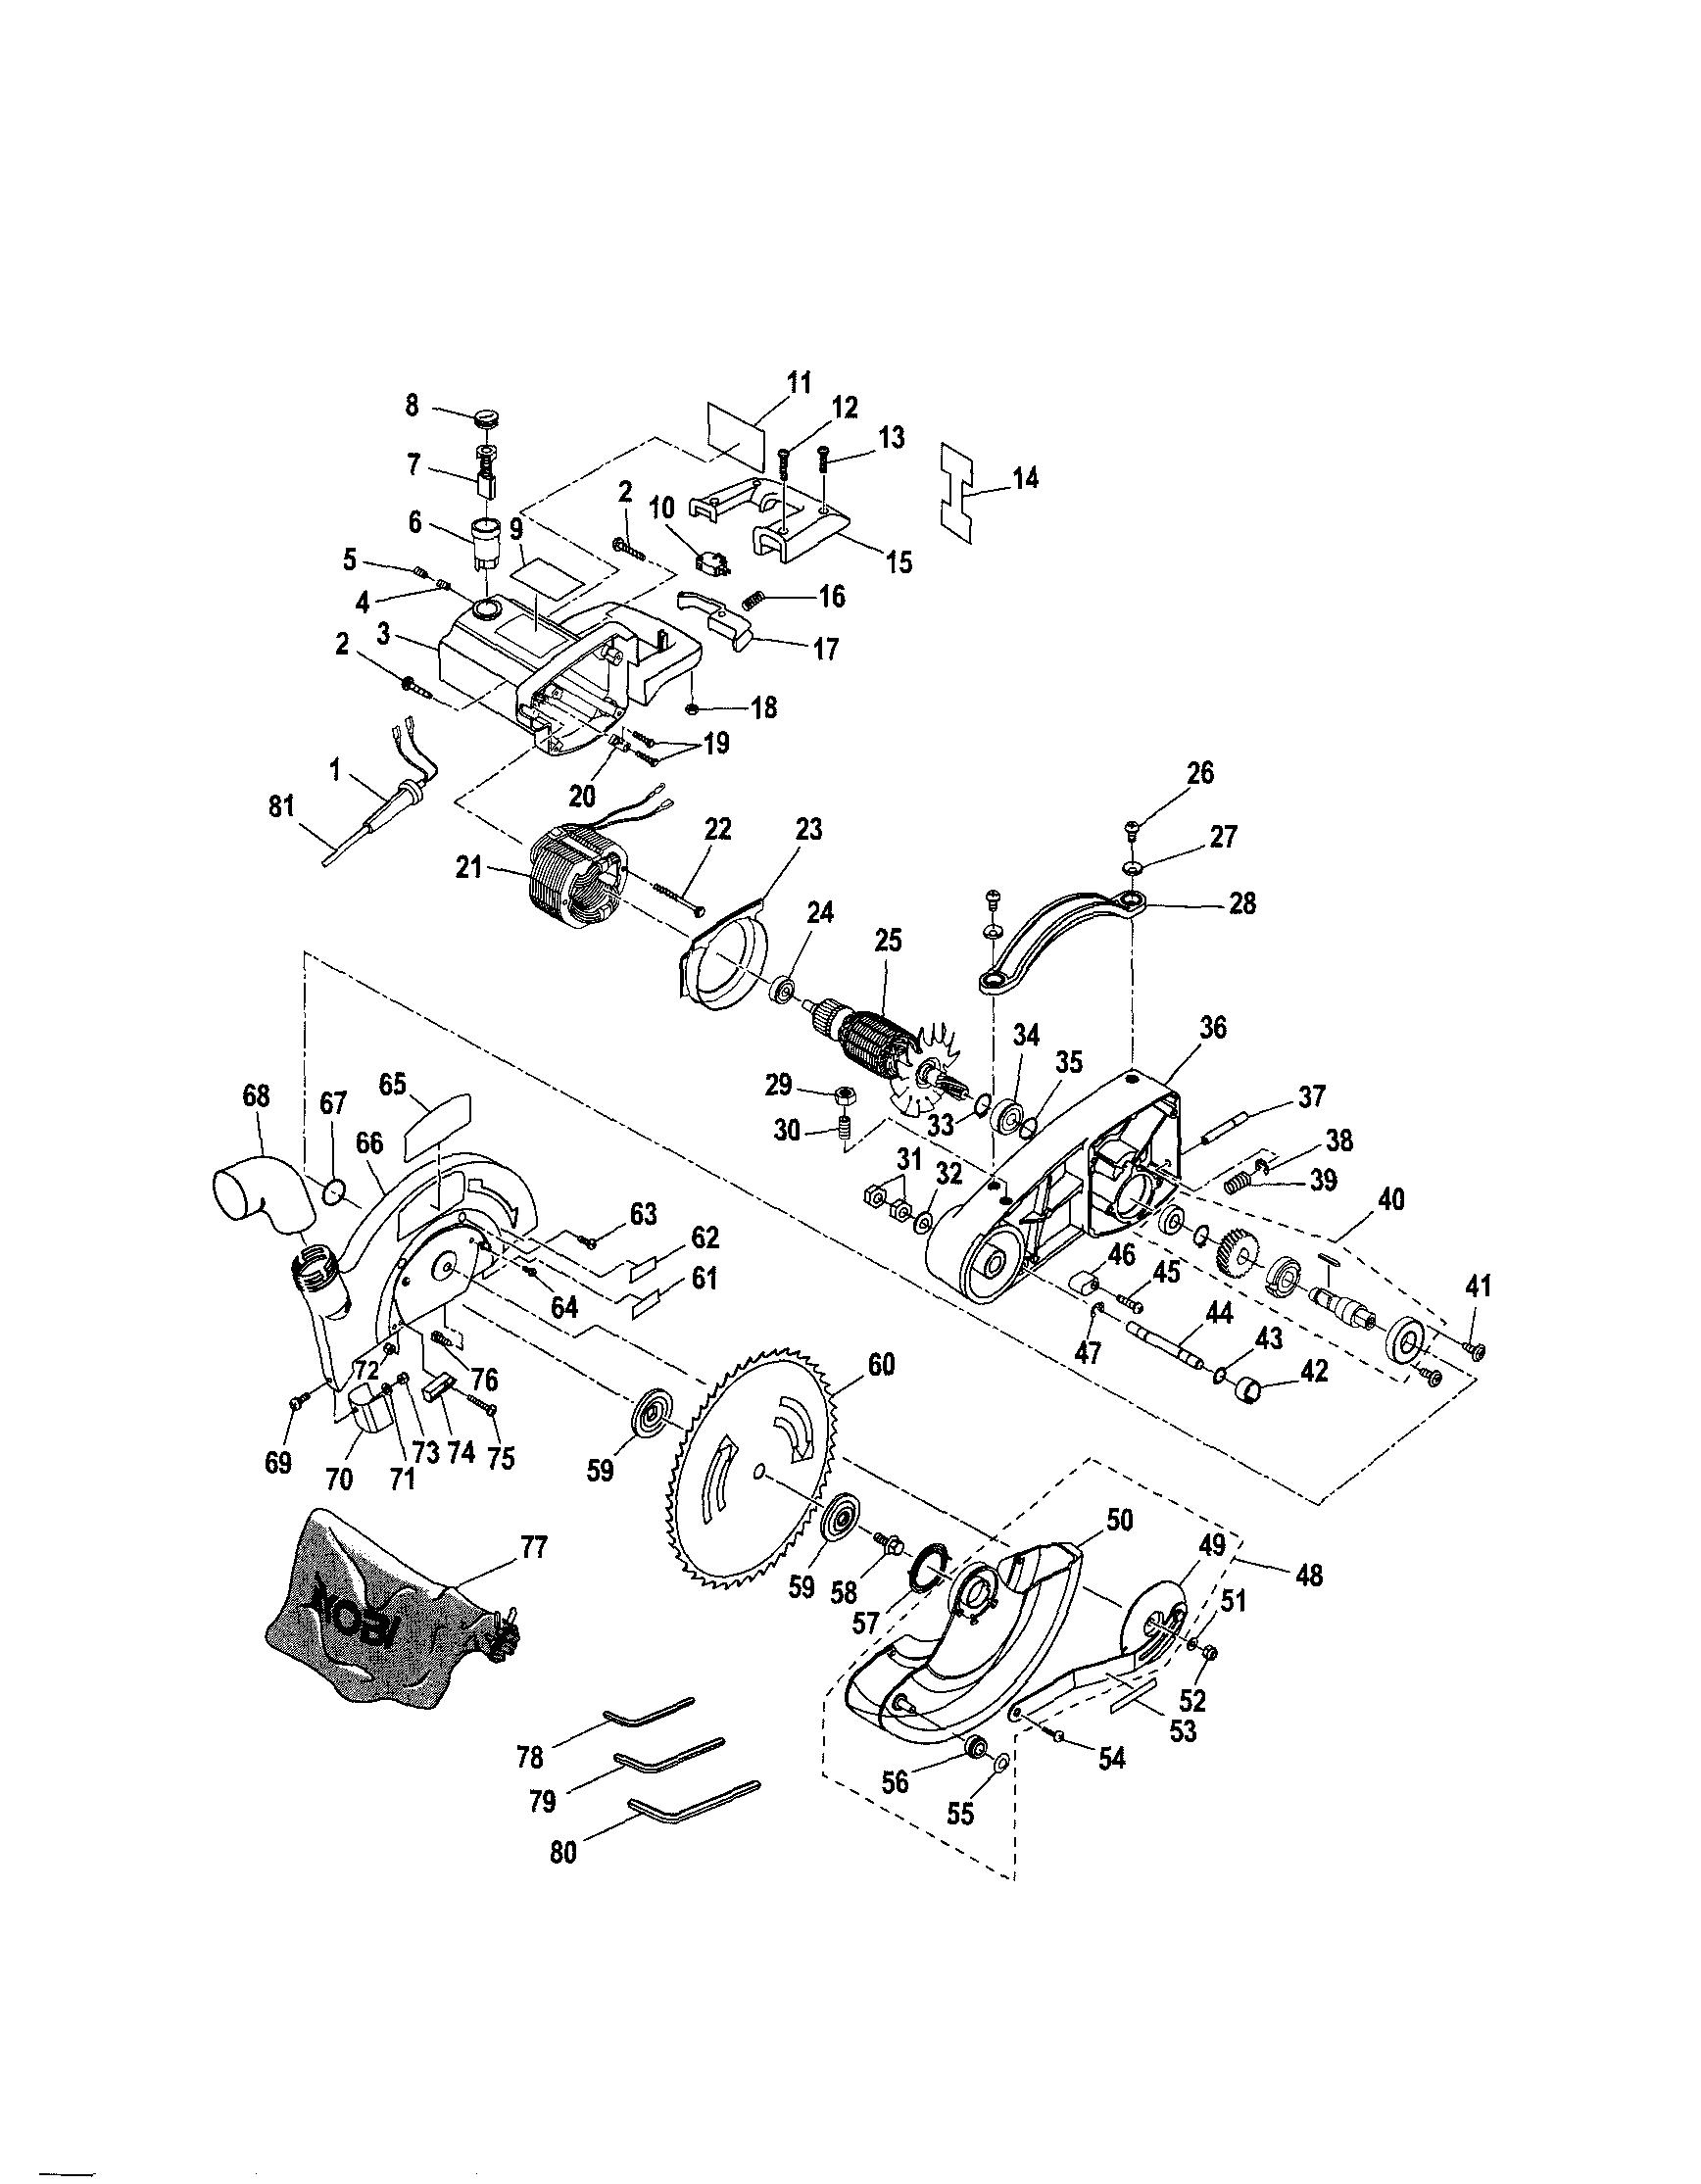 Ryobi model TS1340 miter saw genuine parts